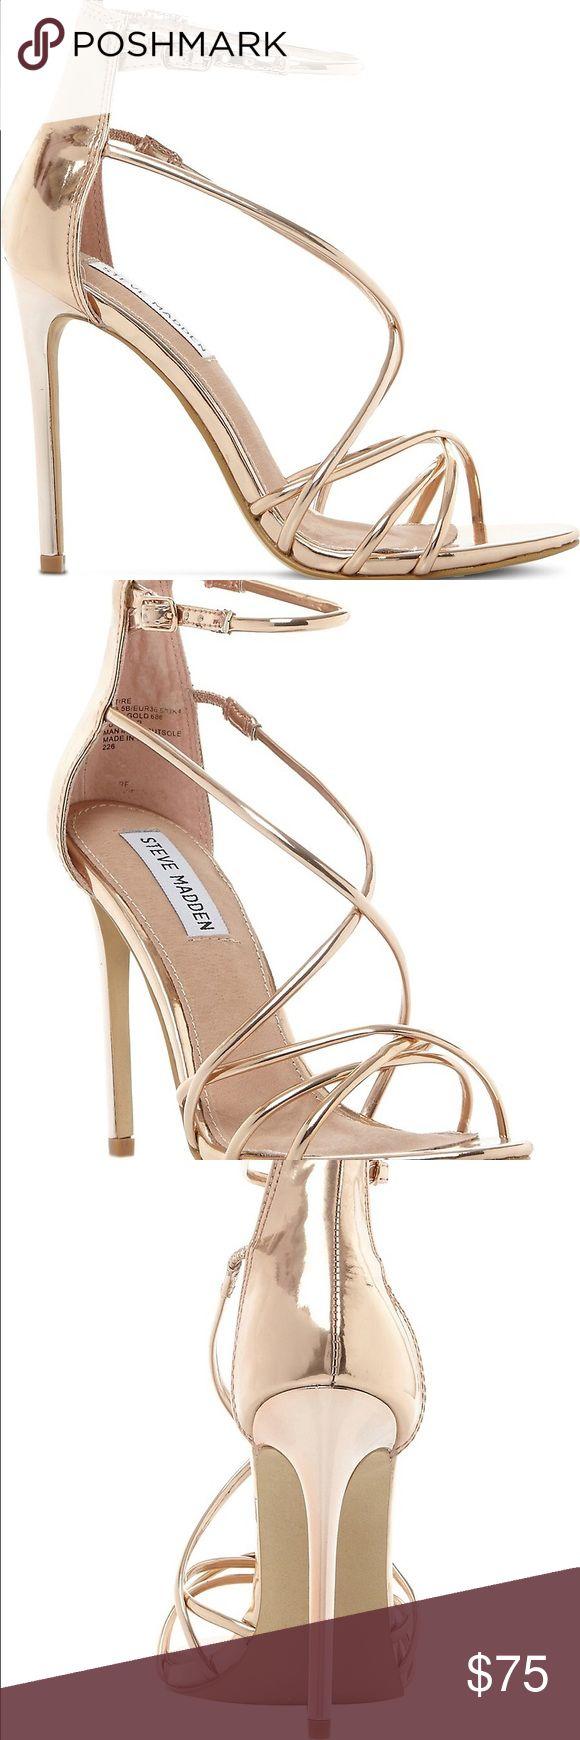 Rose gold sandal heels Strappy and super comfortable. Never worn! Steve Madden Shoes Sandals